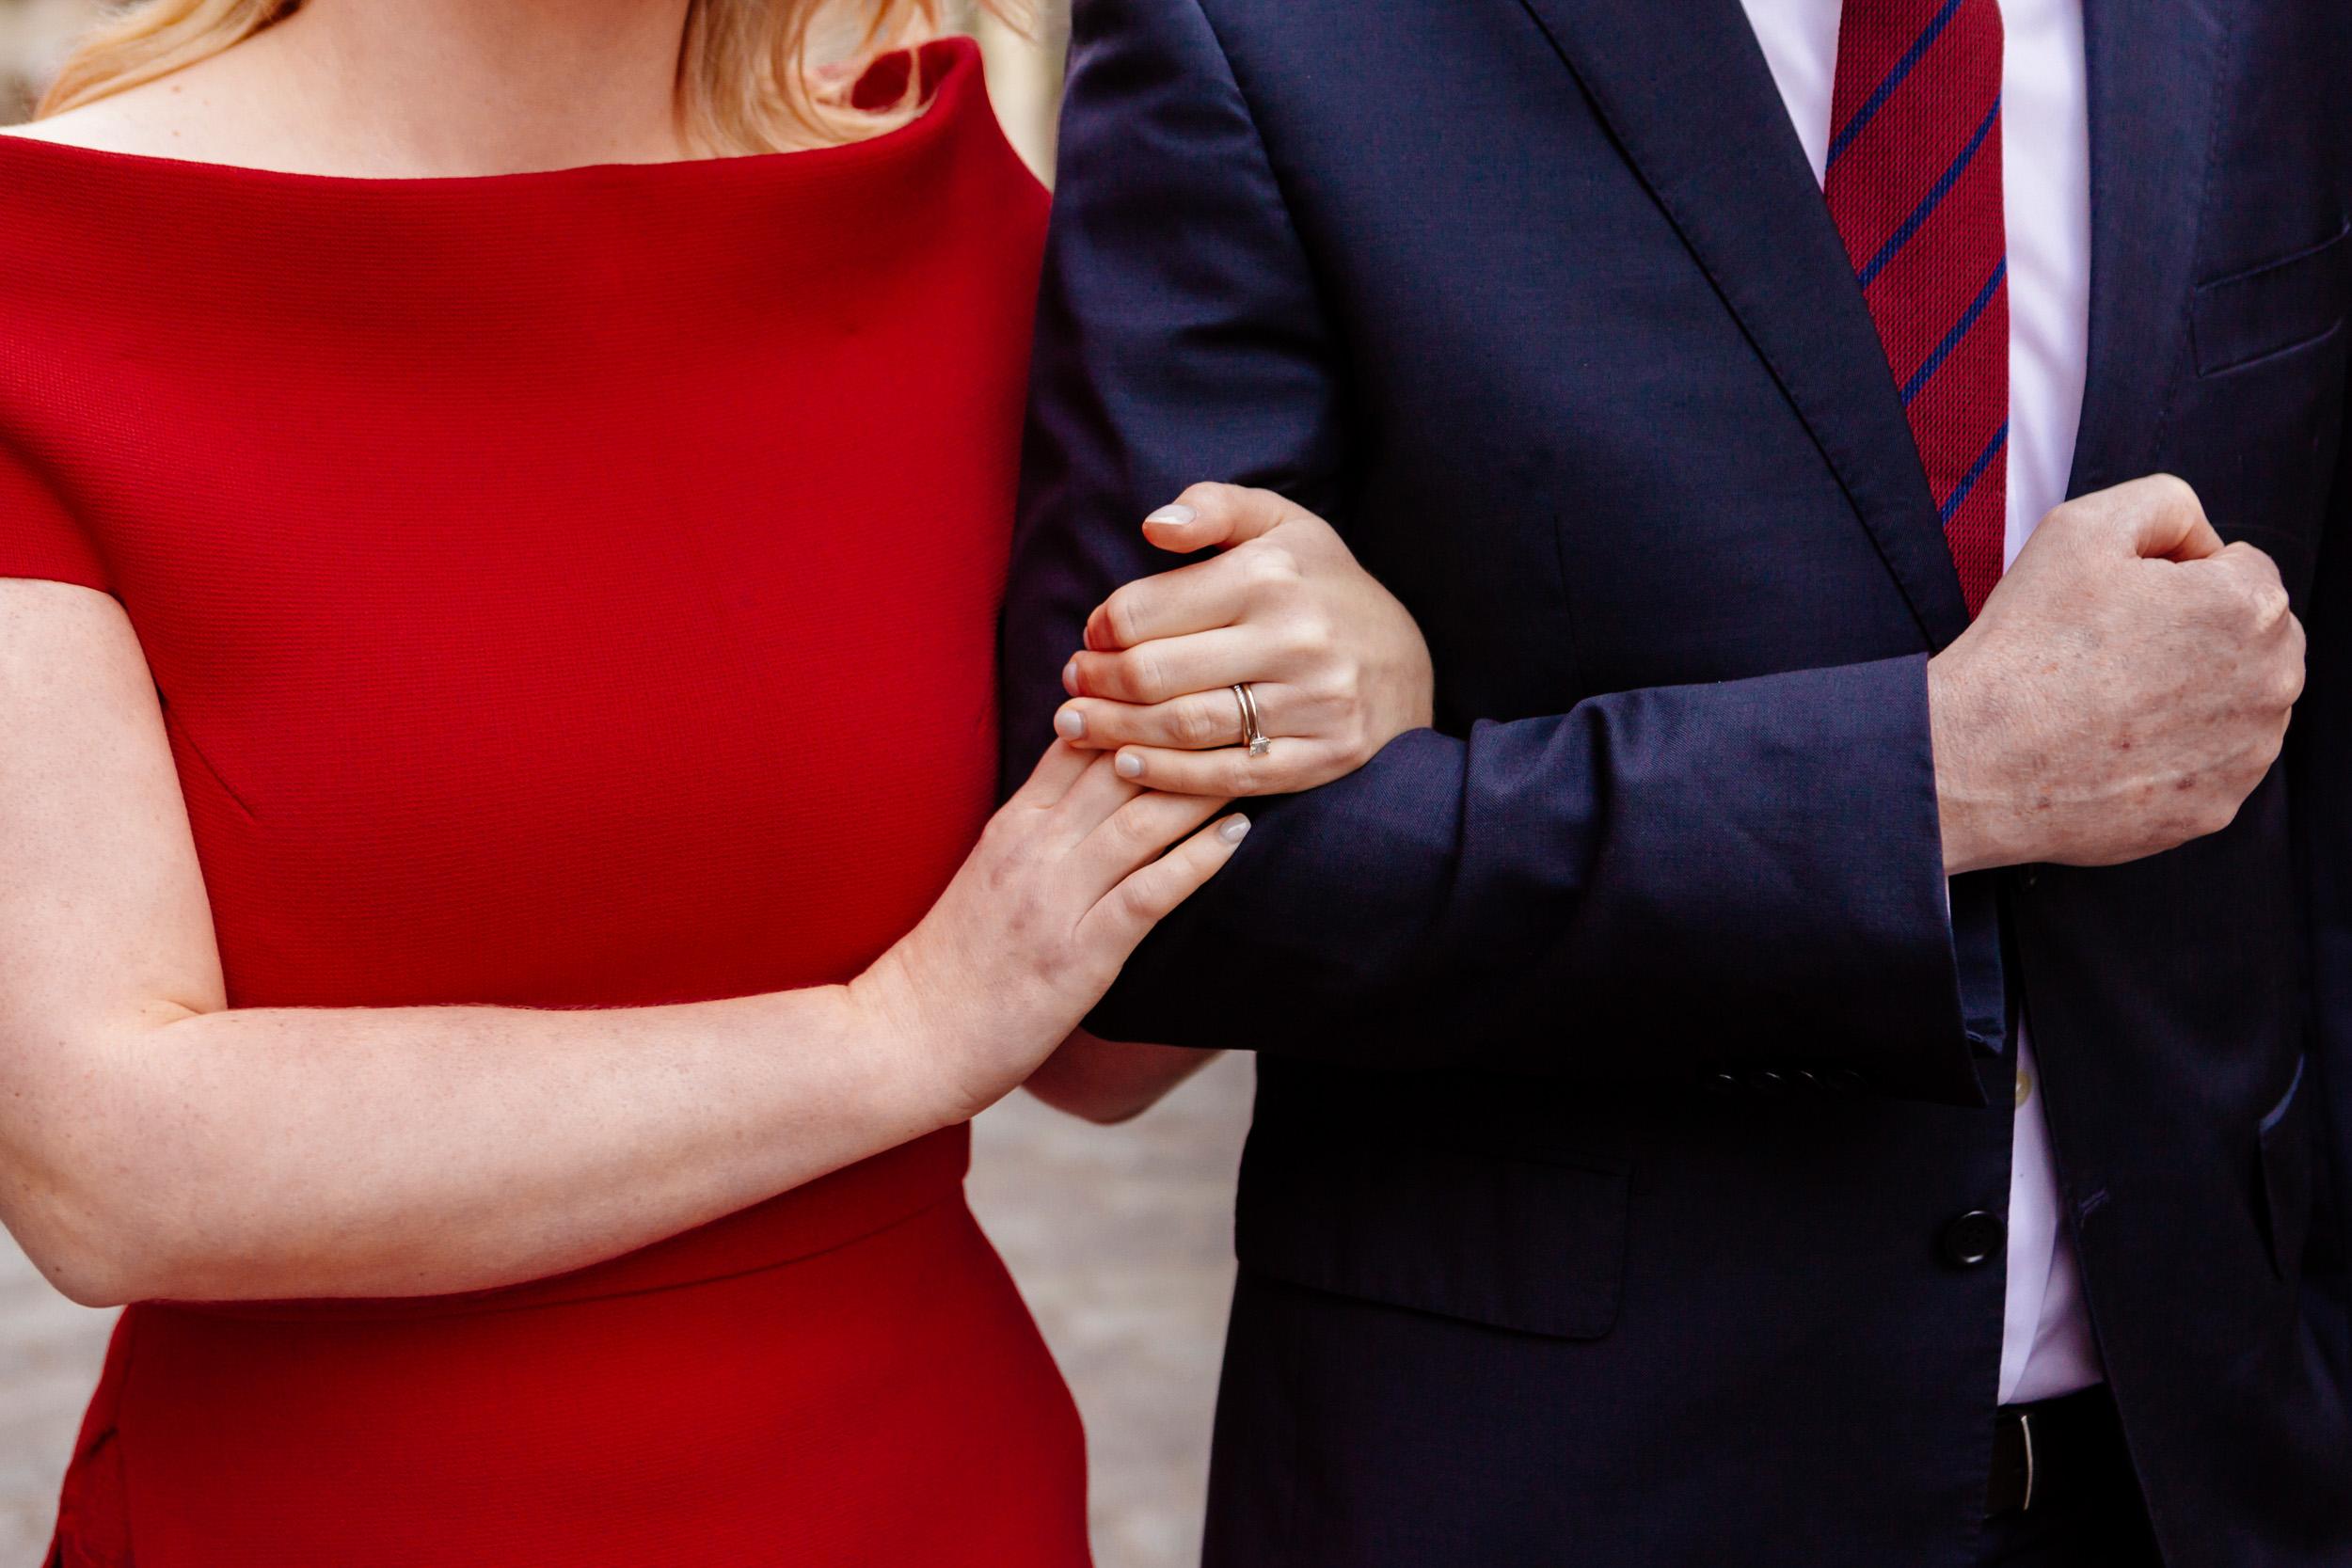 Details photo of a couple holding hands captured by Paris Photographer Federico Guendel www.iheartparis.fr